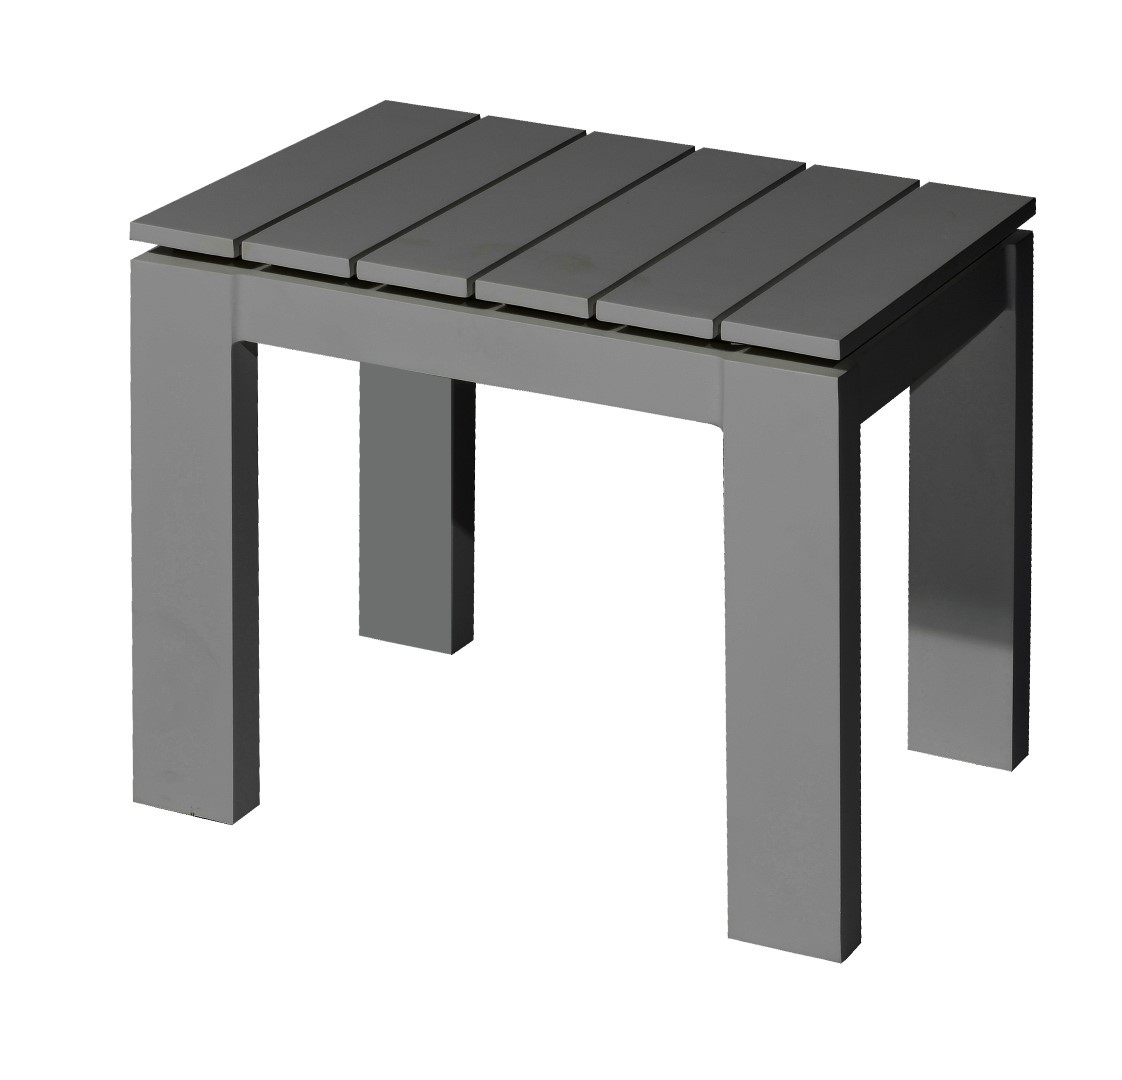 Morris side table 50x40 cm alu anthracite